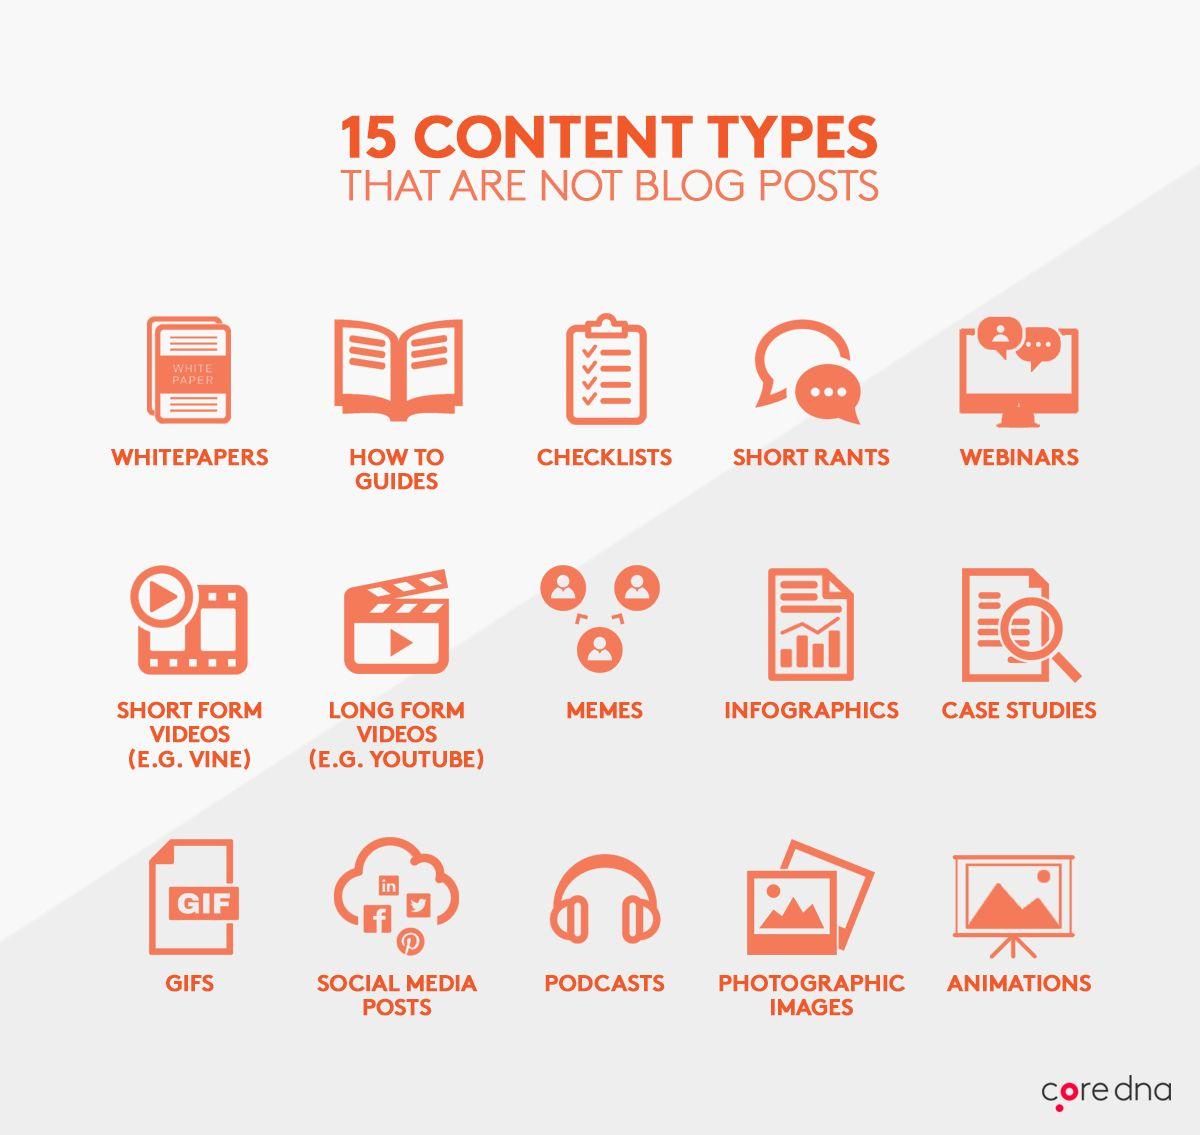 15-content-types